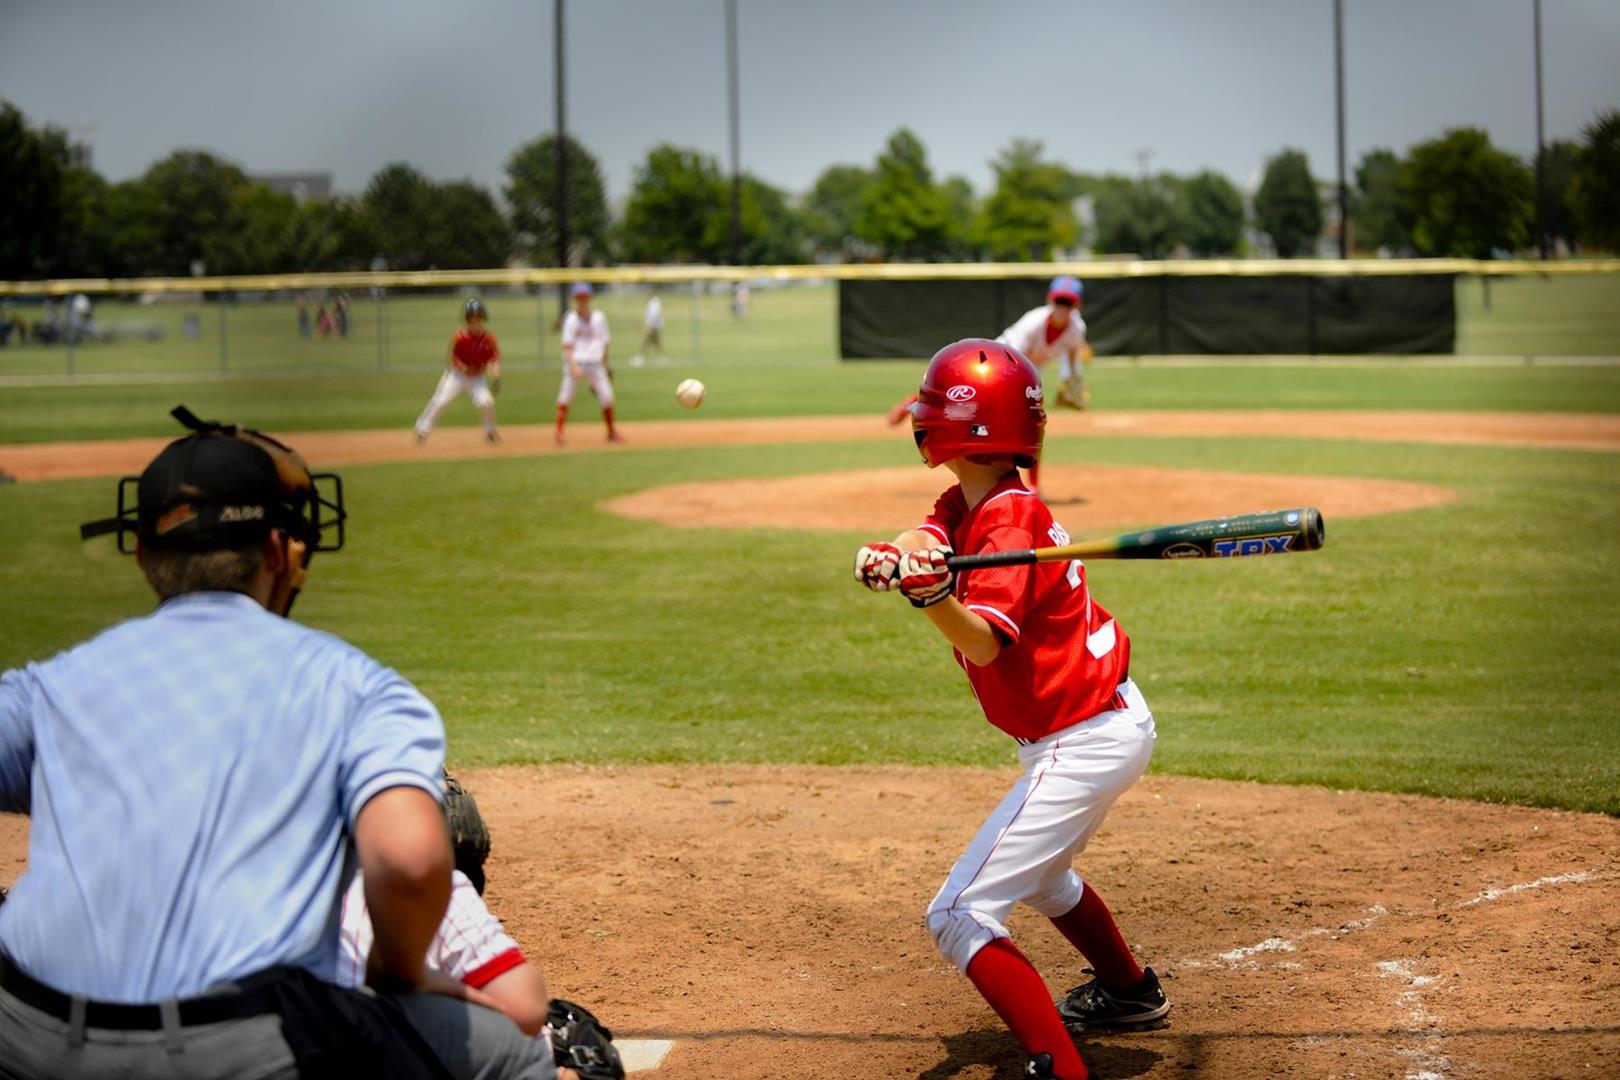 Ma adult softball league